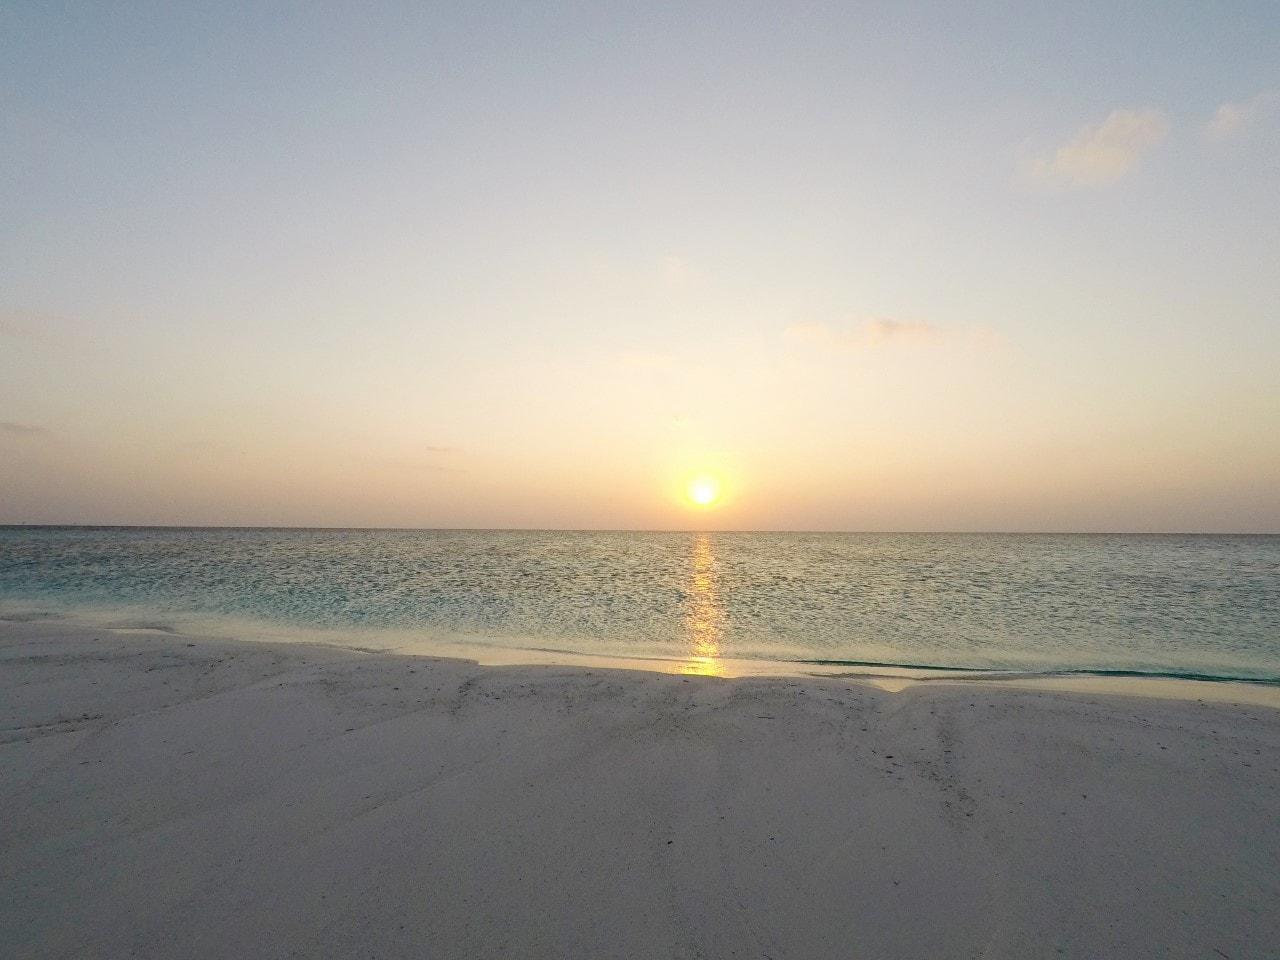 sunset at sandbank